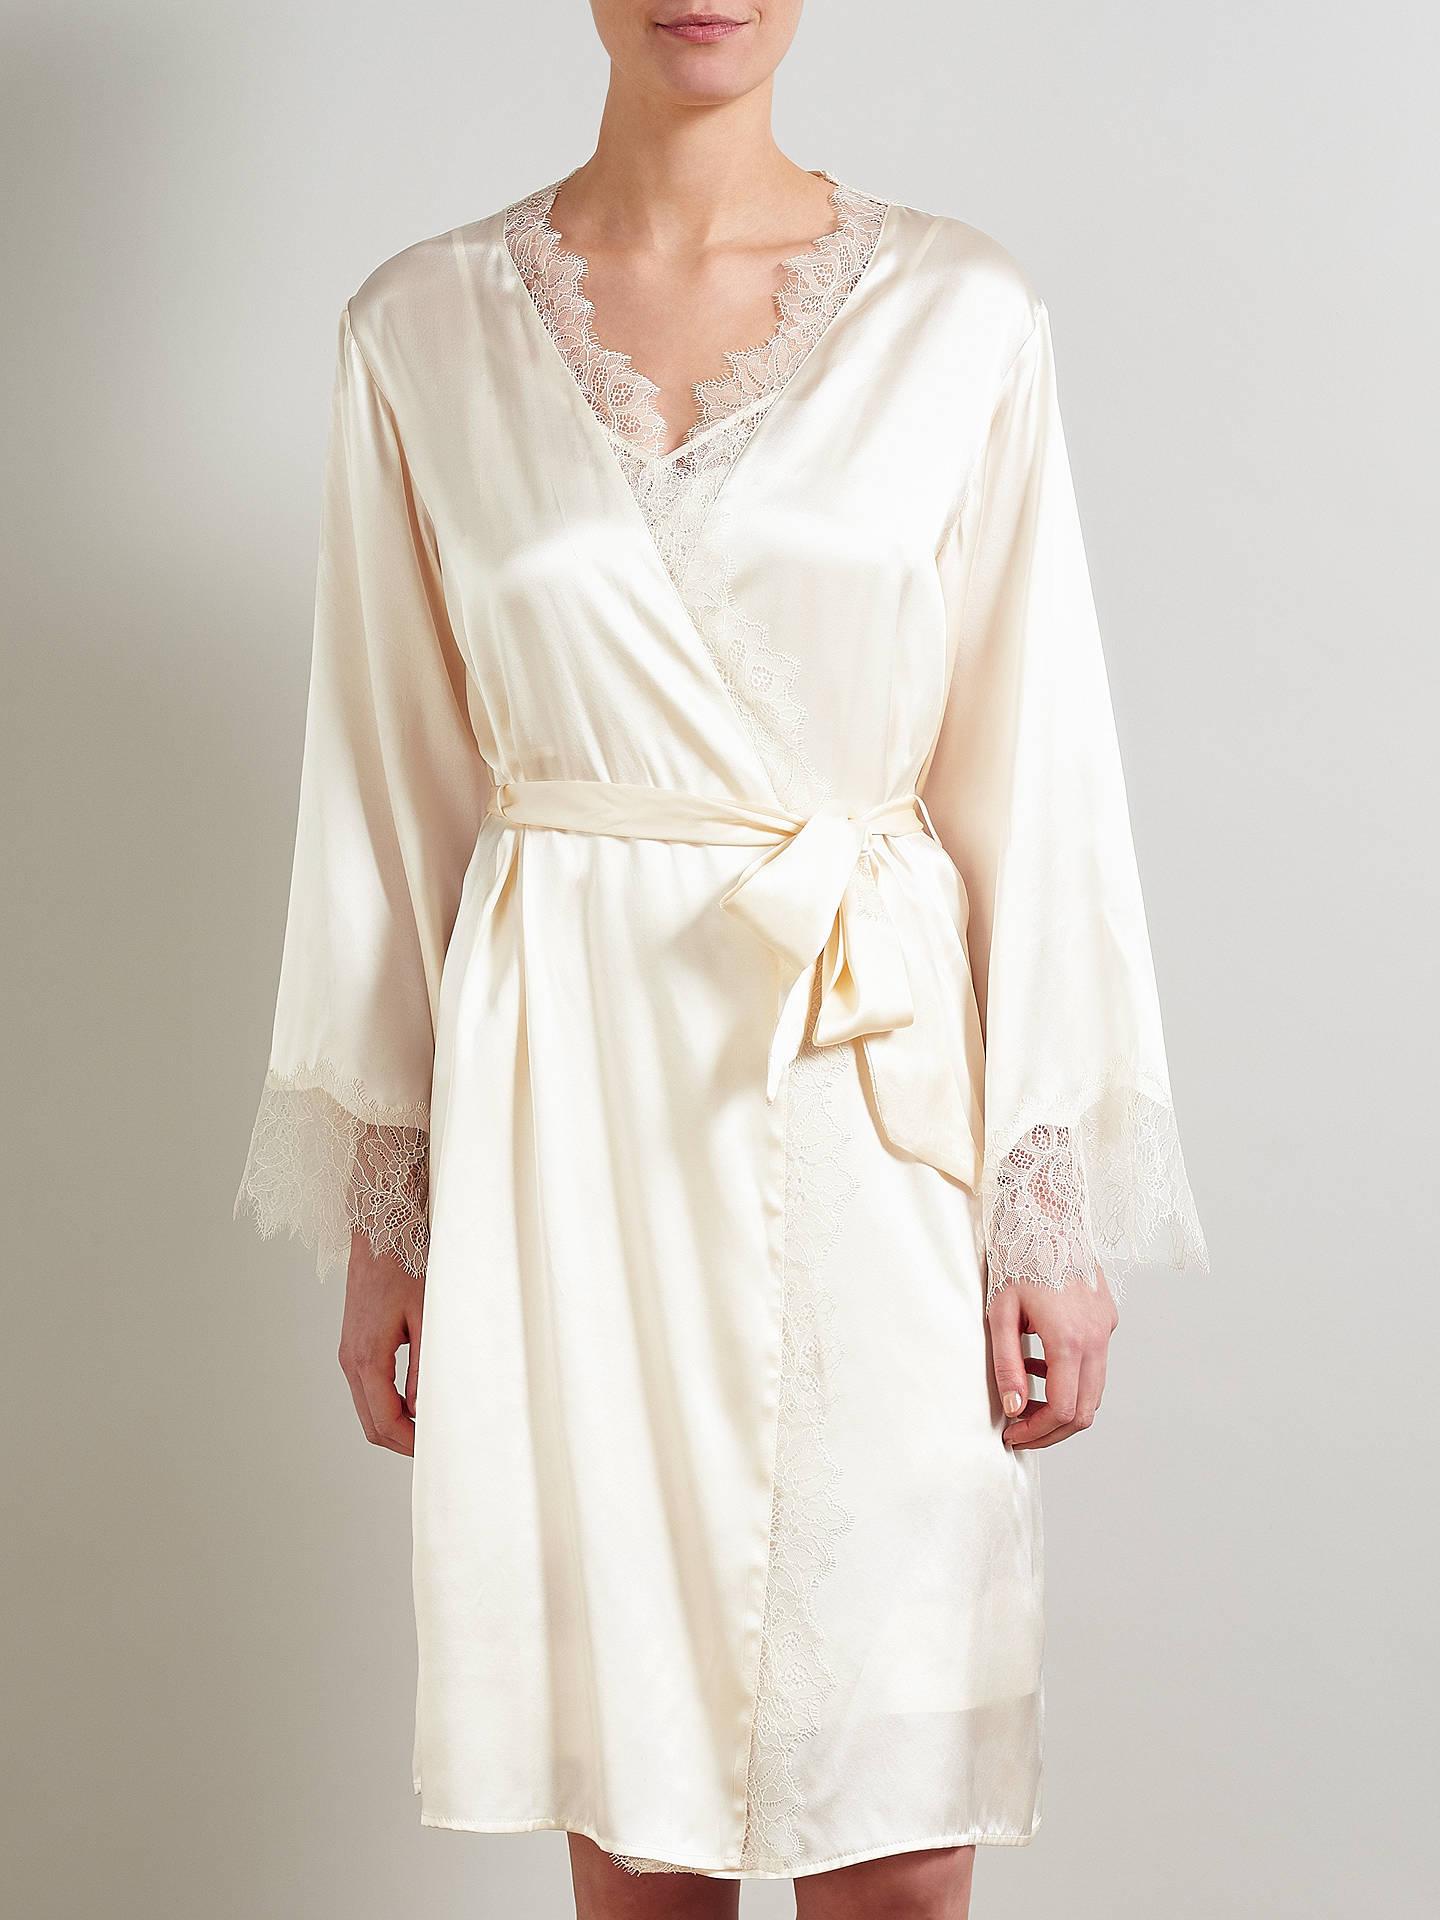 BuySomerset by Alice Temperley Gatsby Bridal Kimono Robe 54ea5b73c